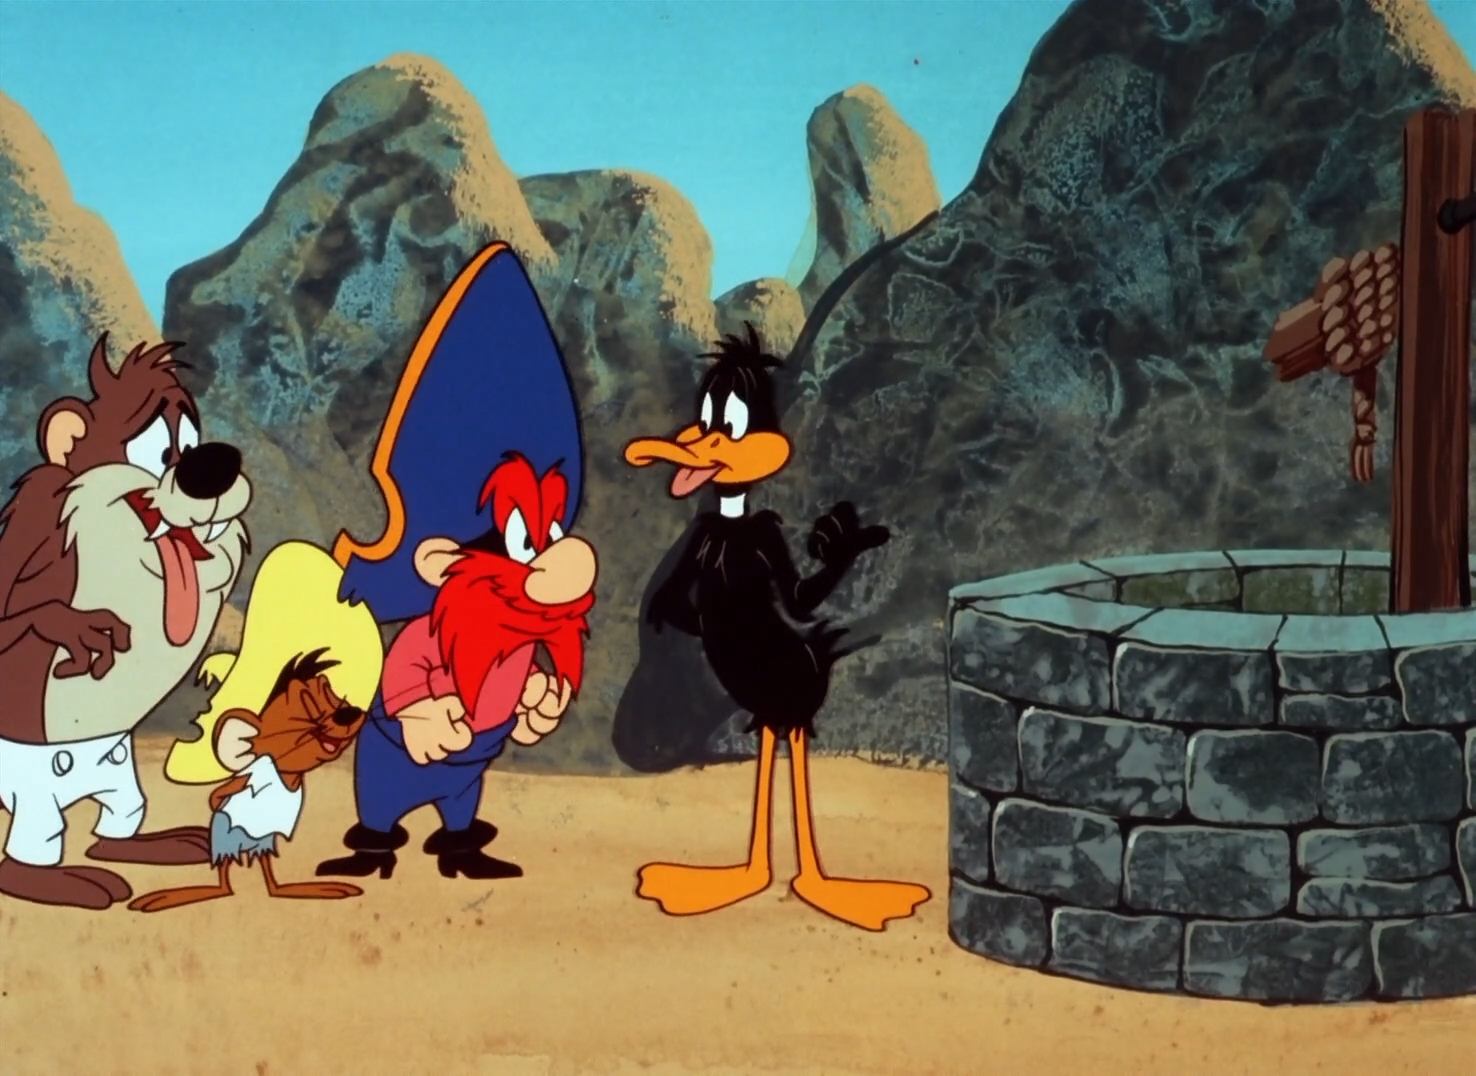 la pelicula del pato lucas isla fantastica (1983)|1080p|Lat